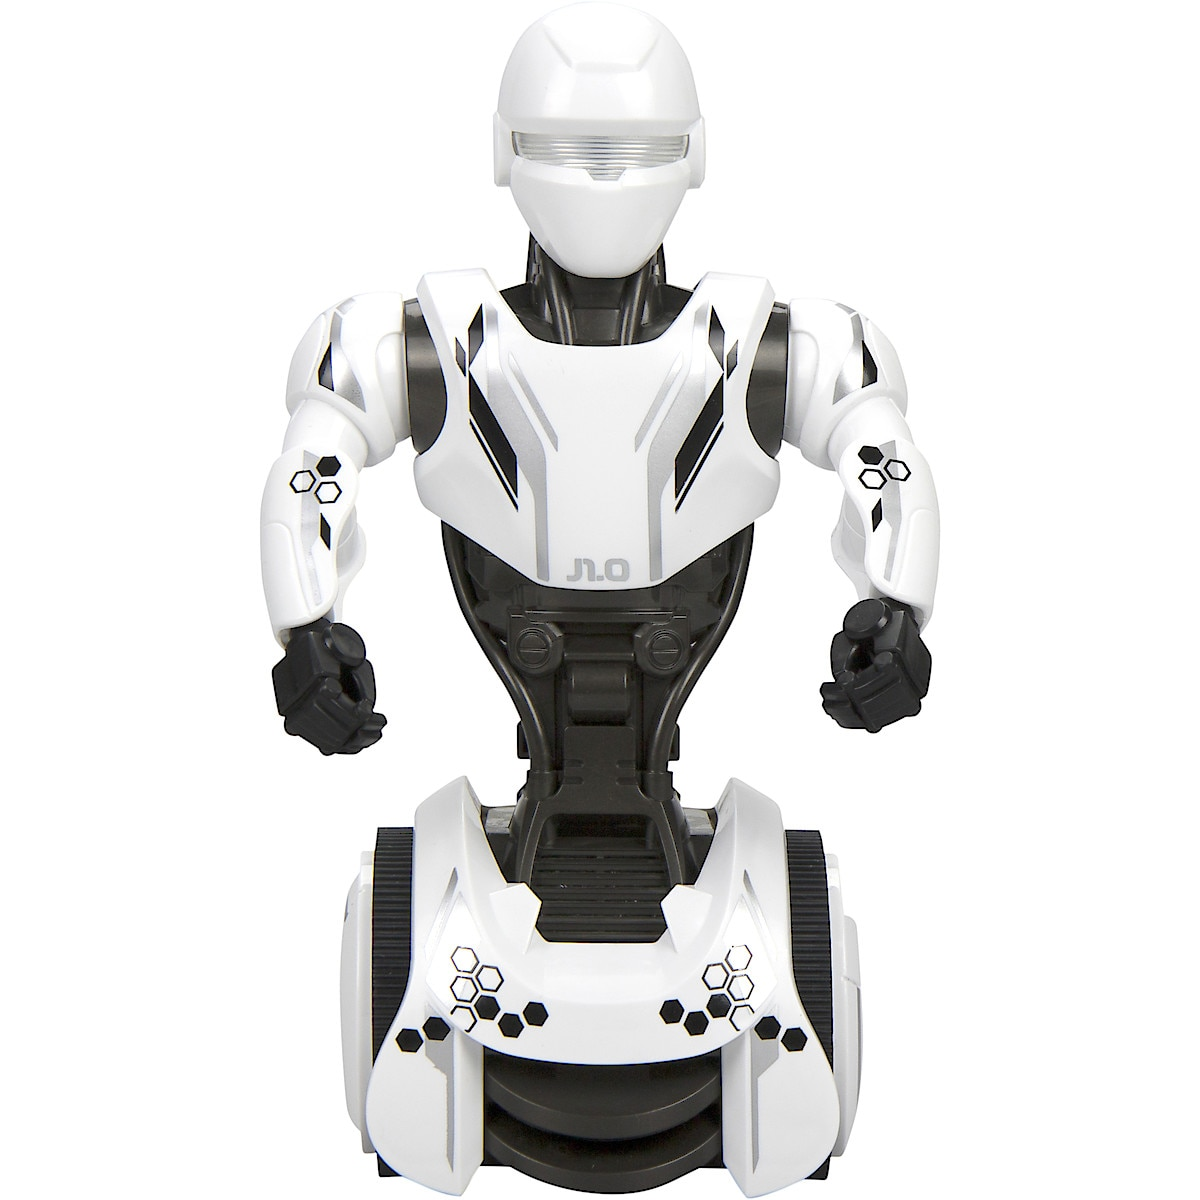 Robotti Junior 1.0, YCOO NEO by Silverlit